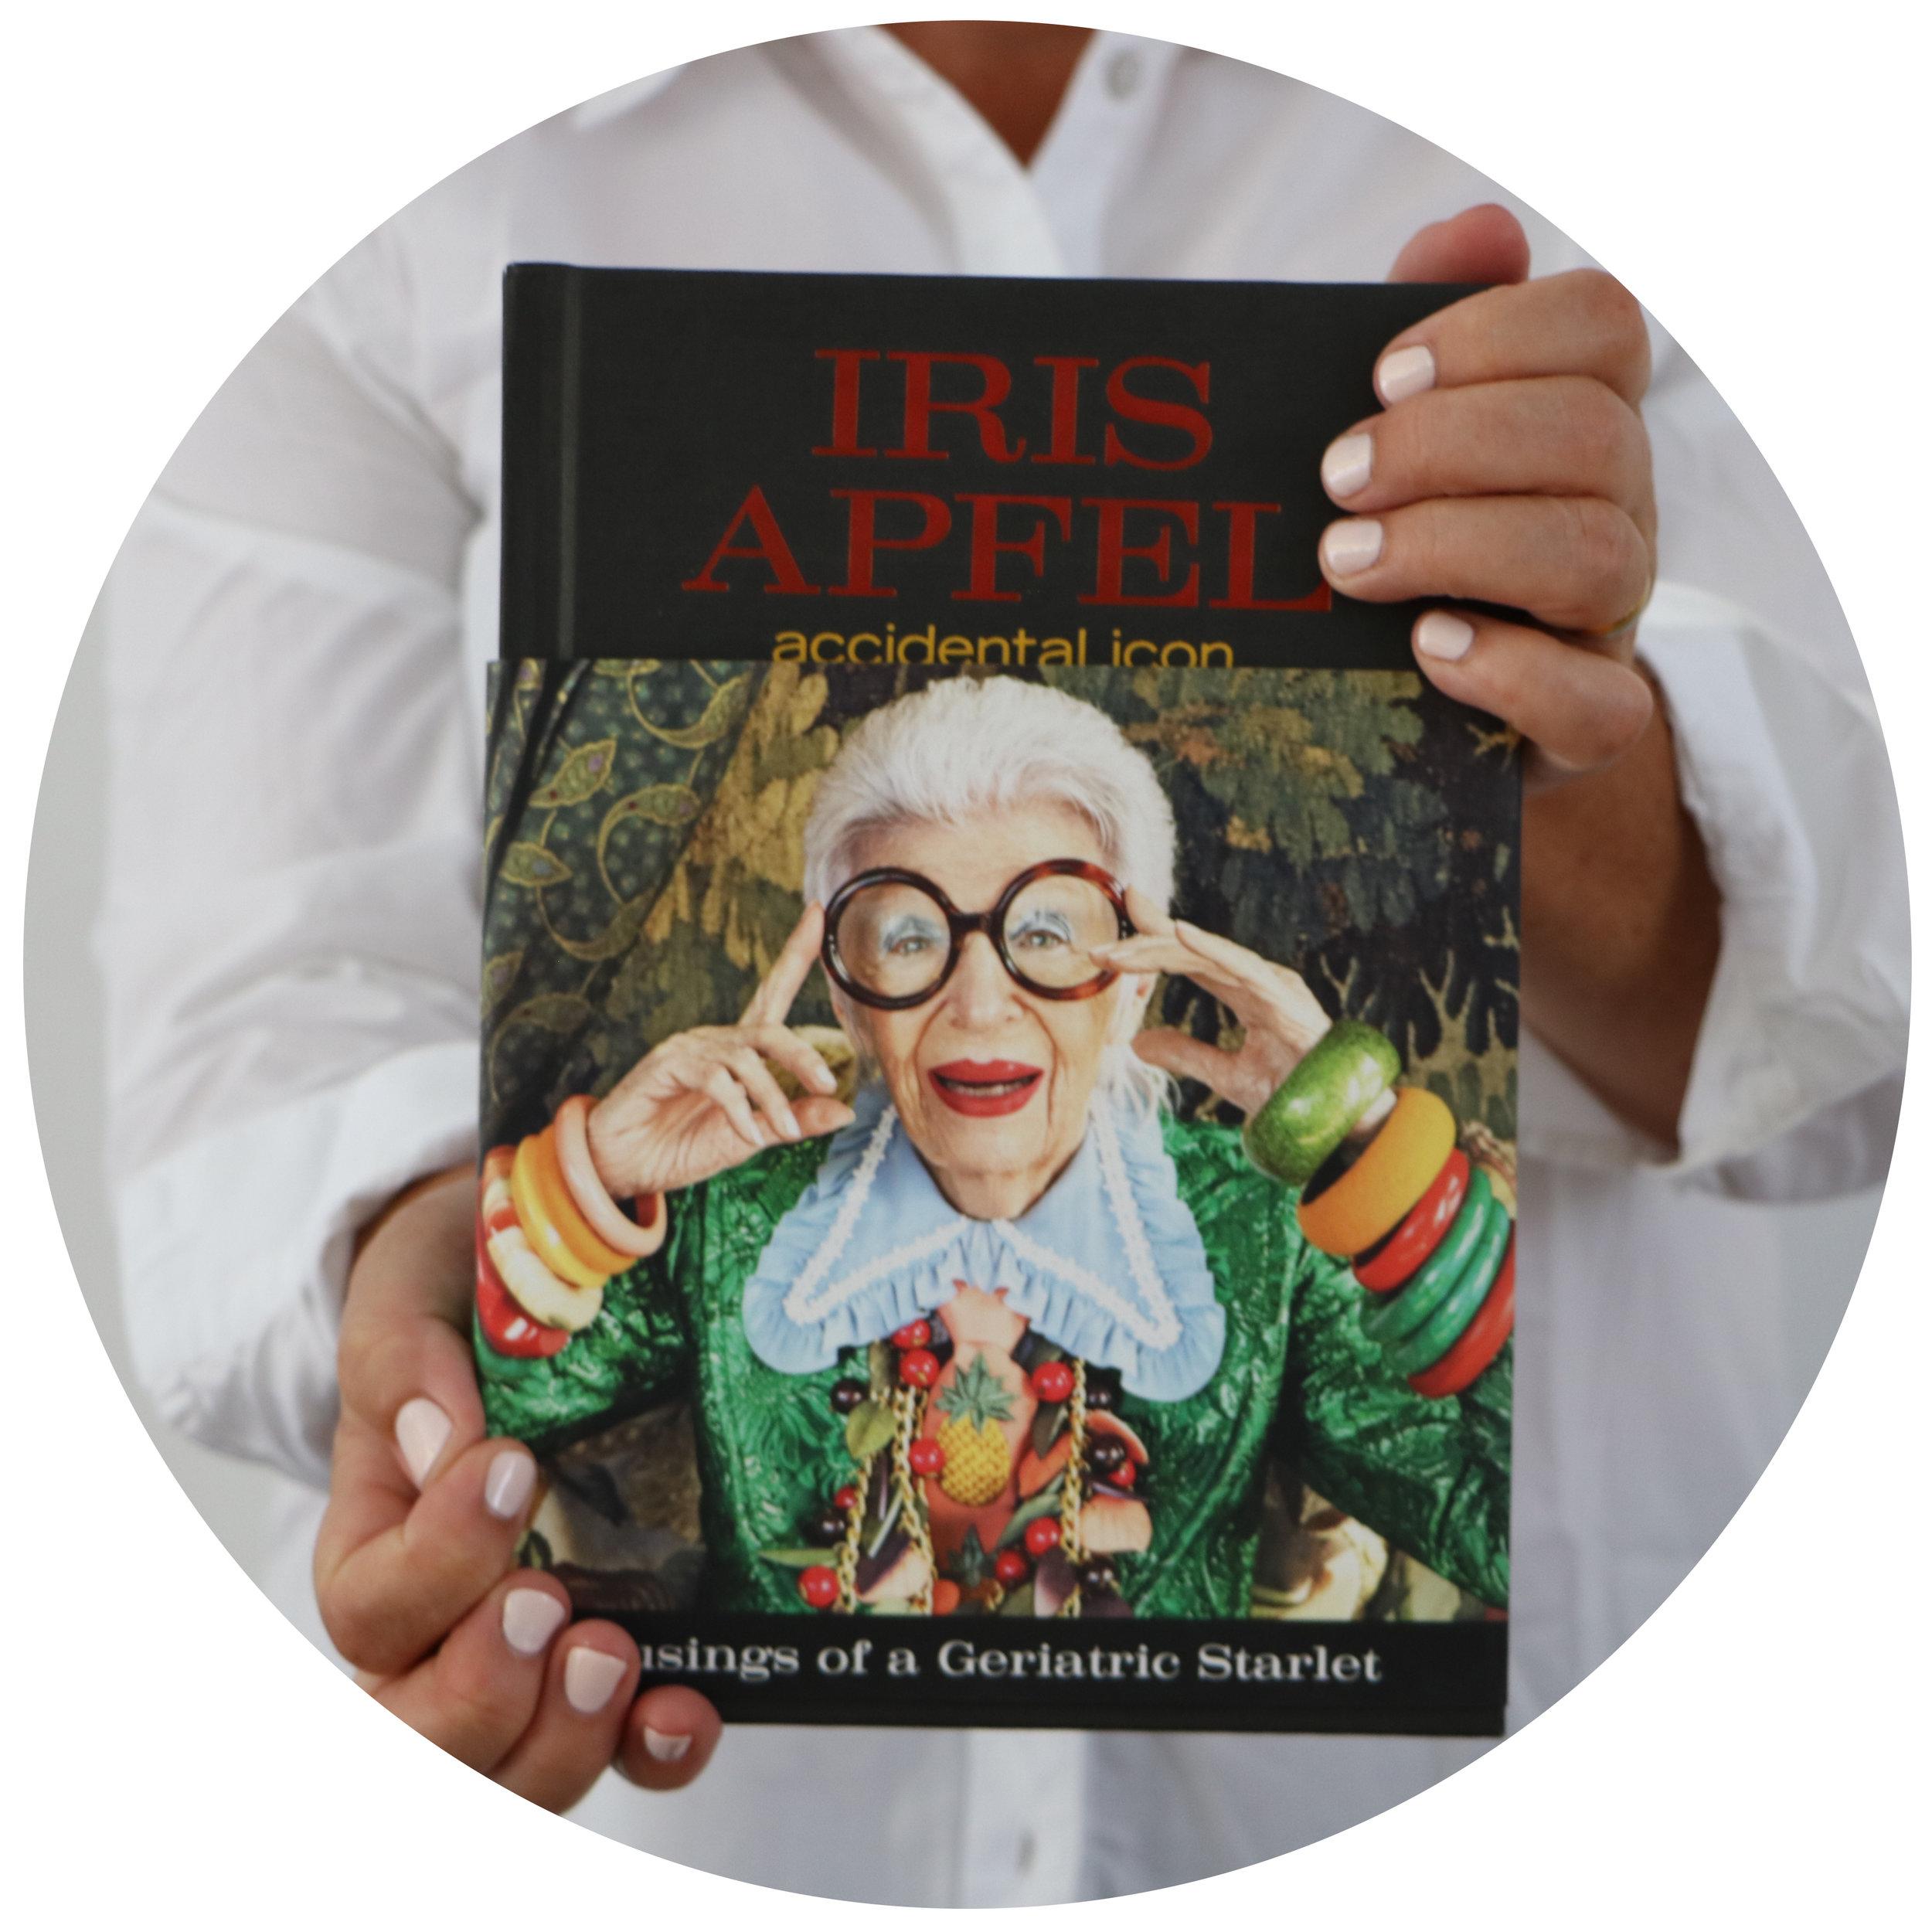 Iris Apfel - Accidental Icon